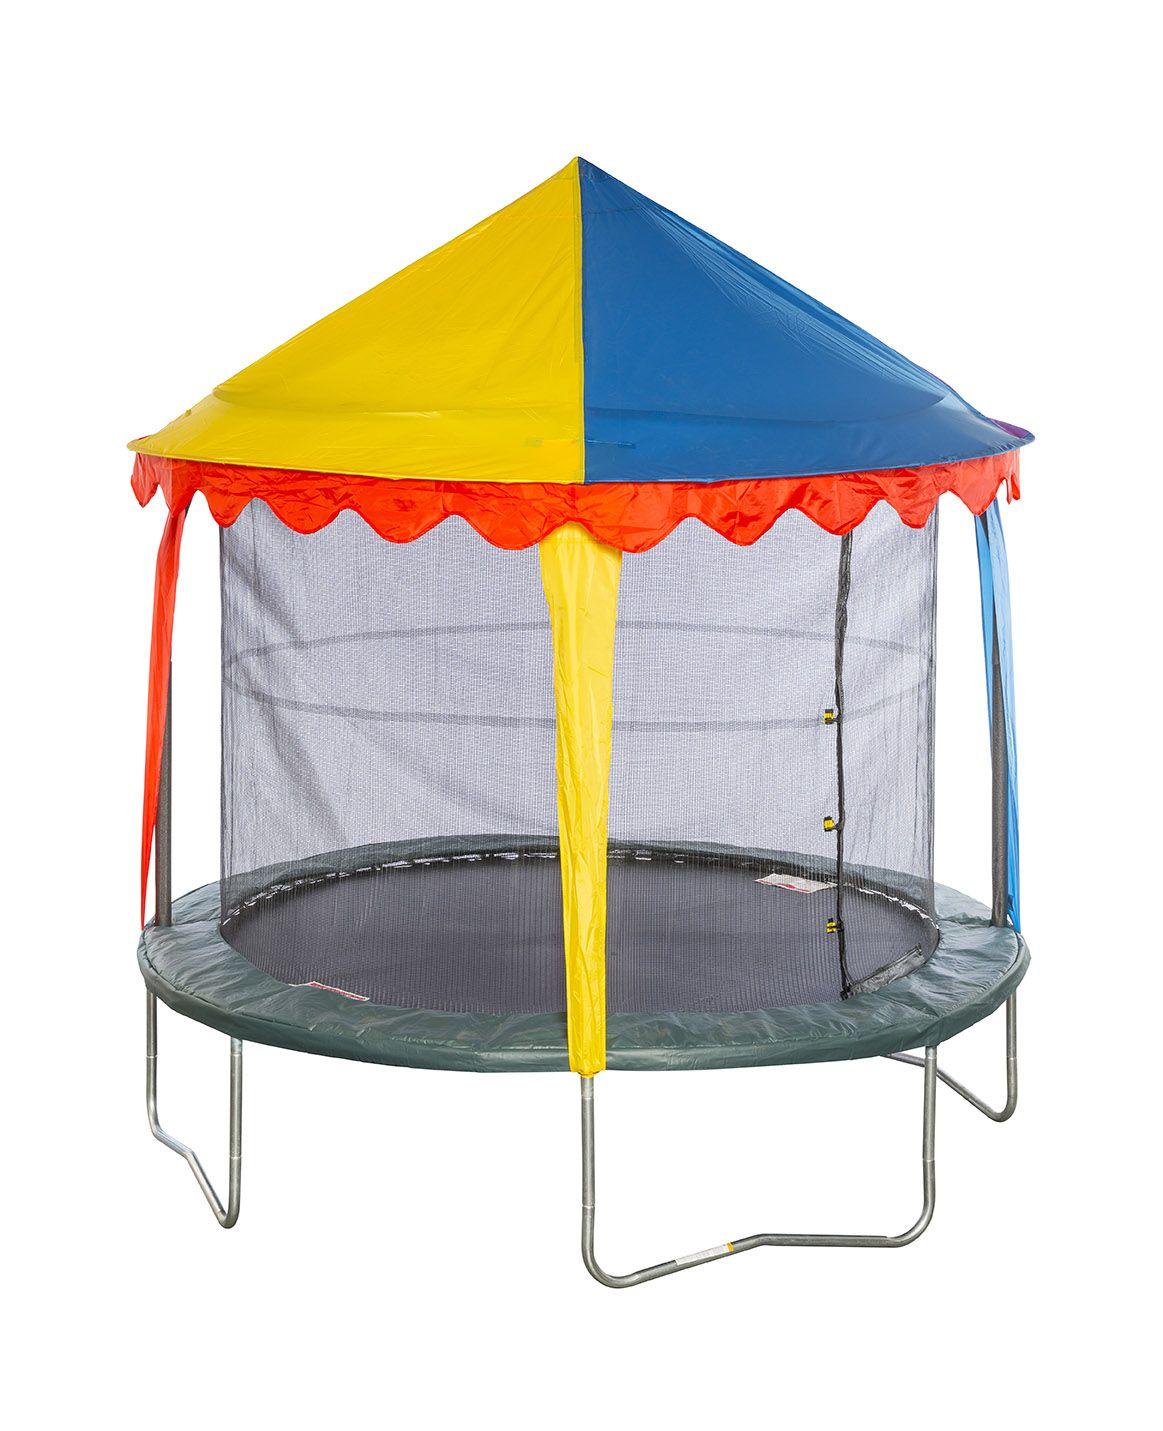 #Jumpking #Canopy #Circus #Tent  sc 1 st  Pinterest & Jumpking #Canopy #Circus #Tent | Trampoline Tents u0026 Canopies ...